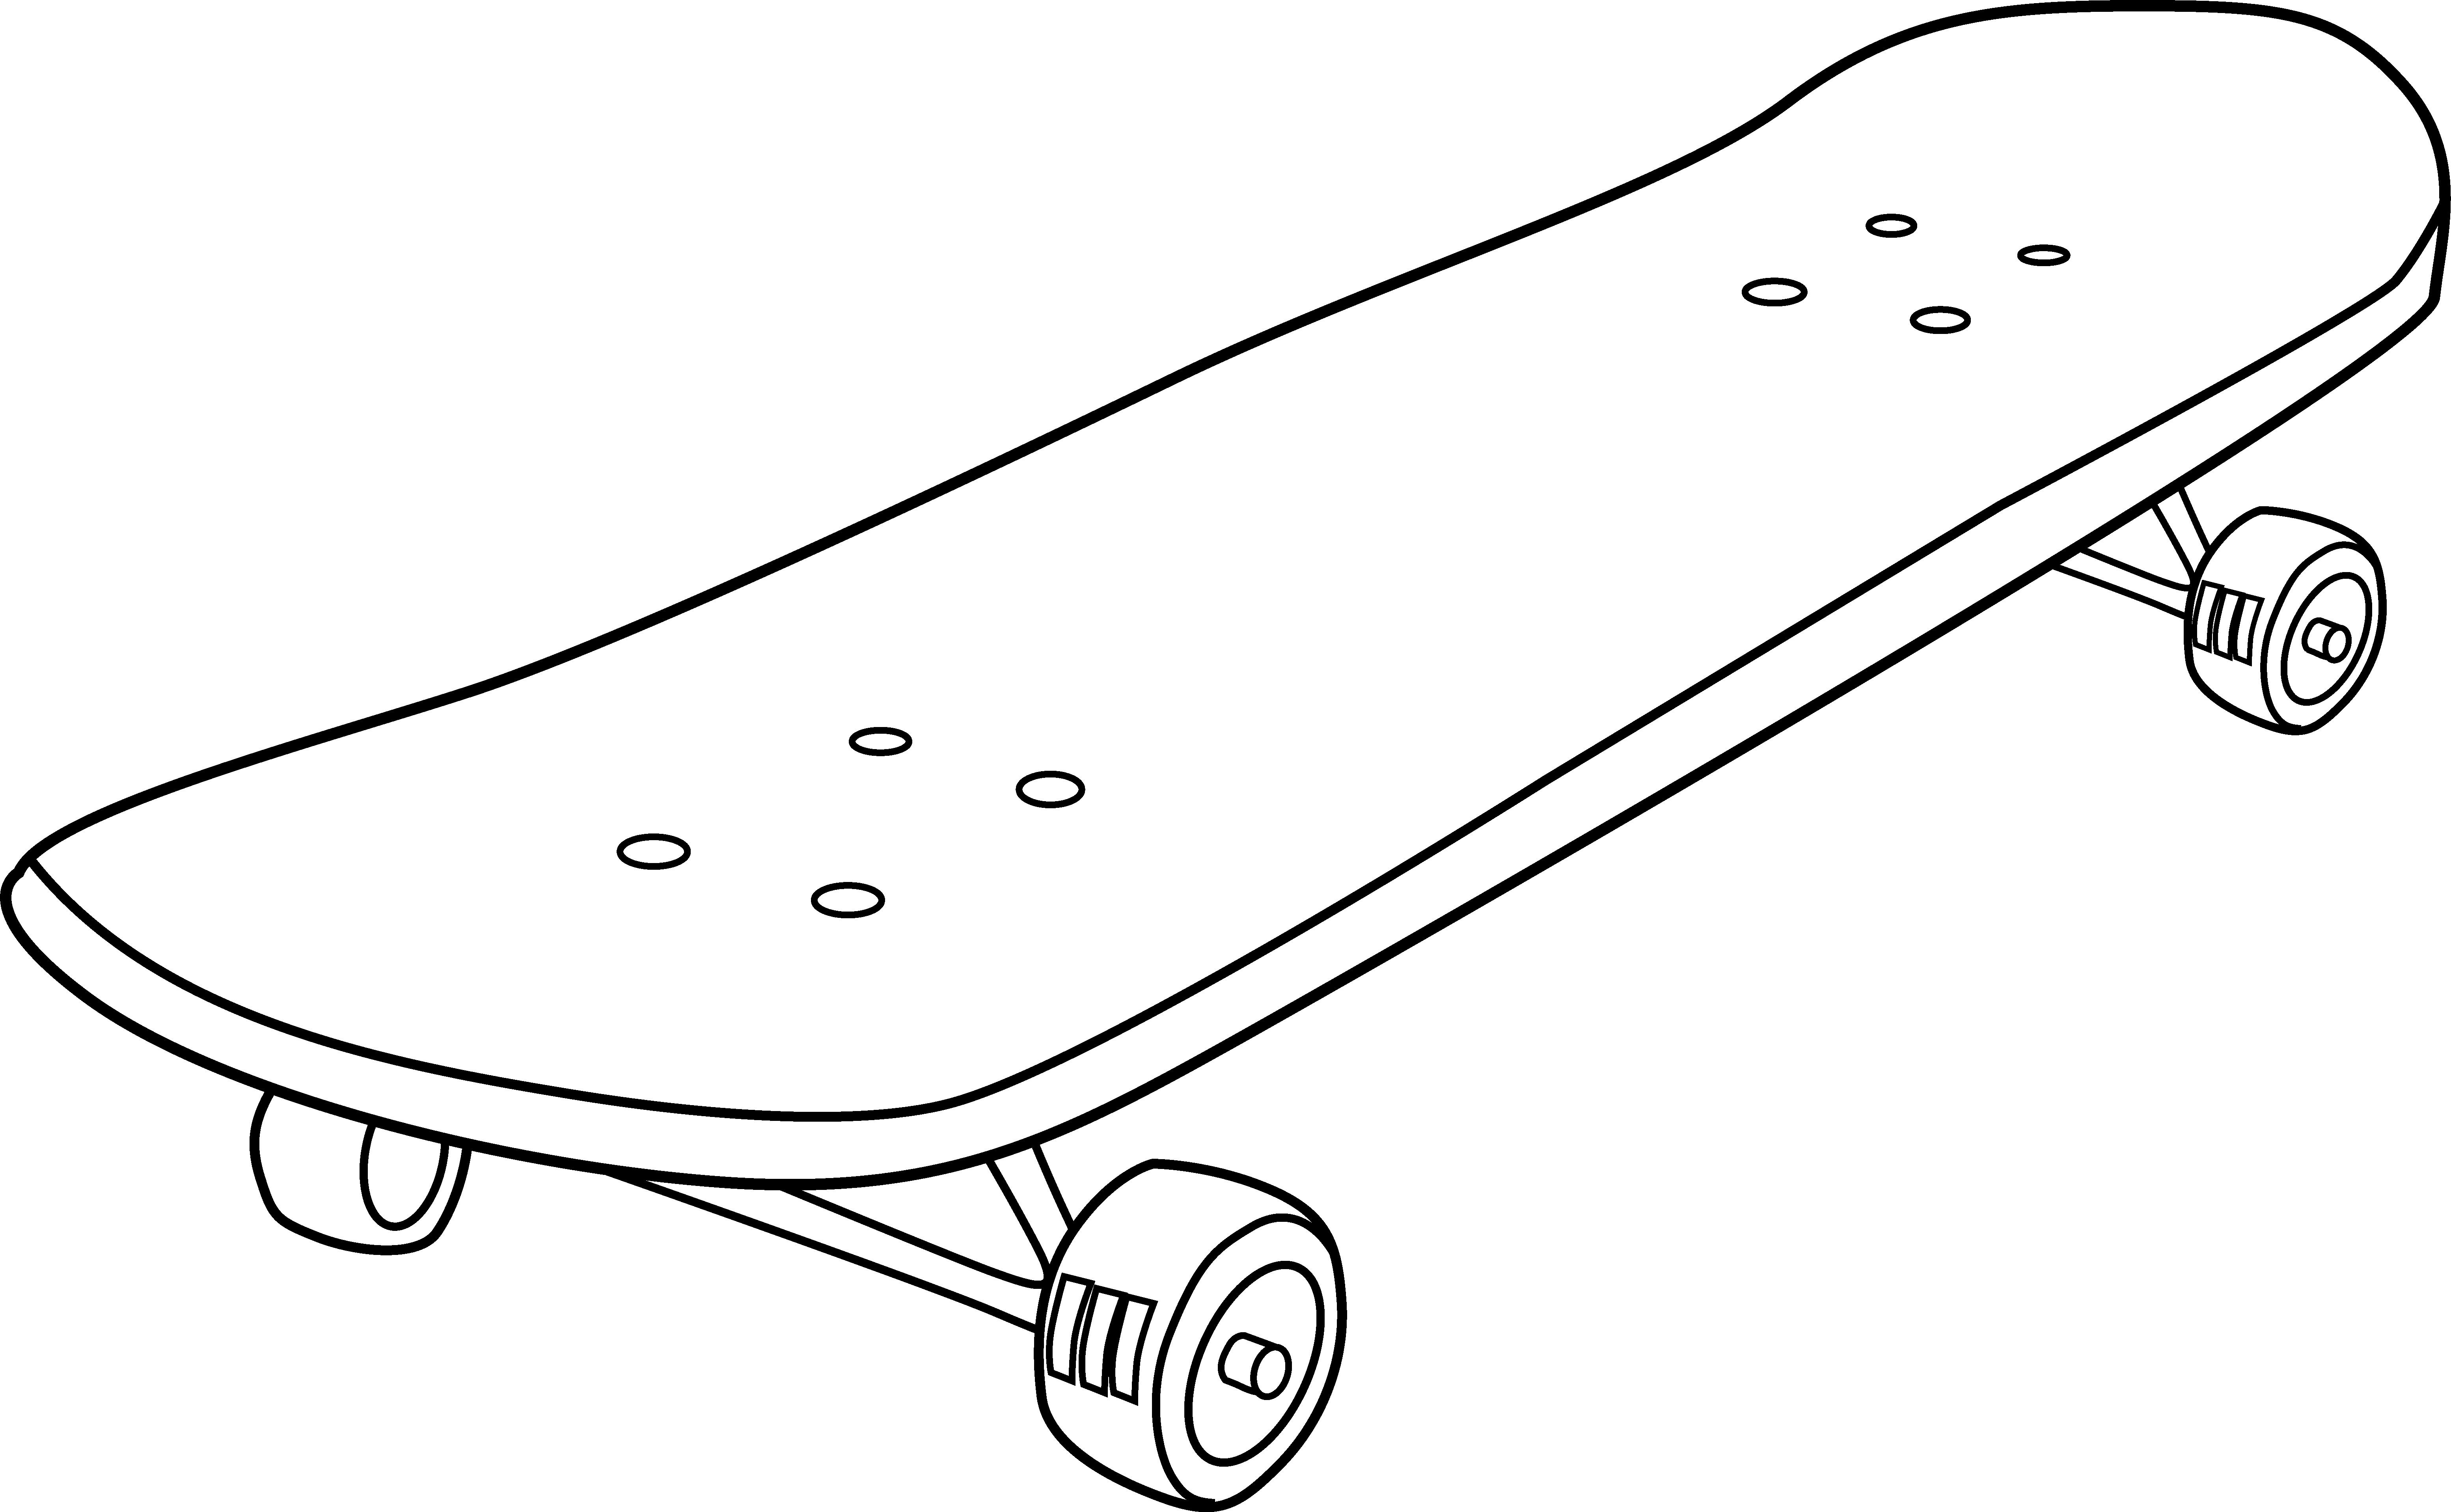 Skateboard designs clipart banner Skateboard clipart 4 - ClipartPost banner